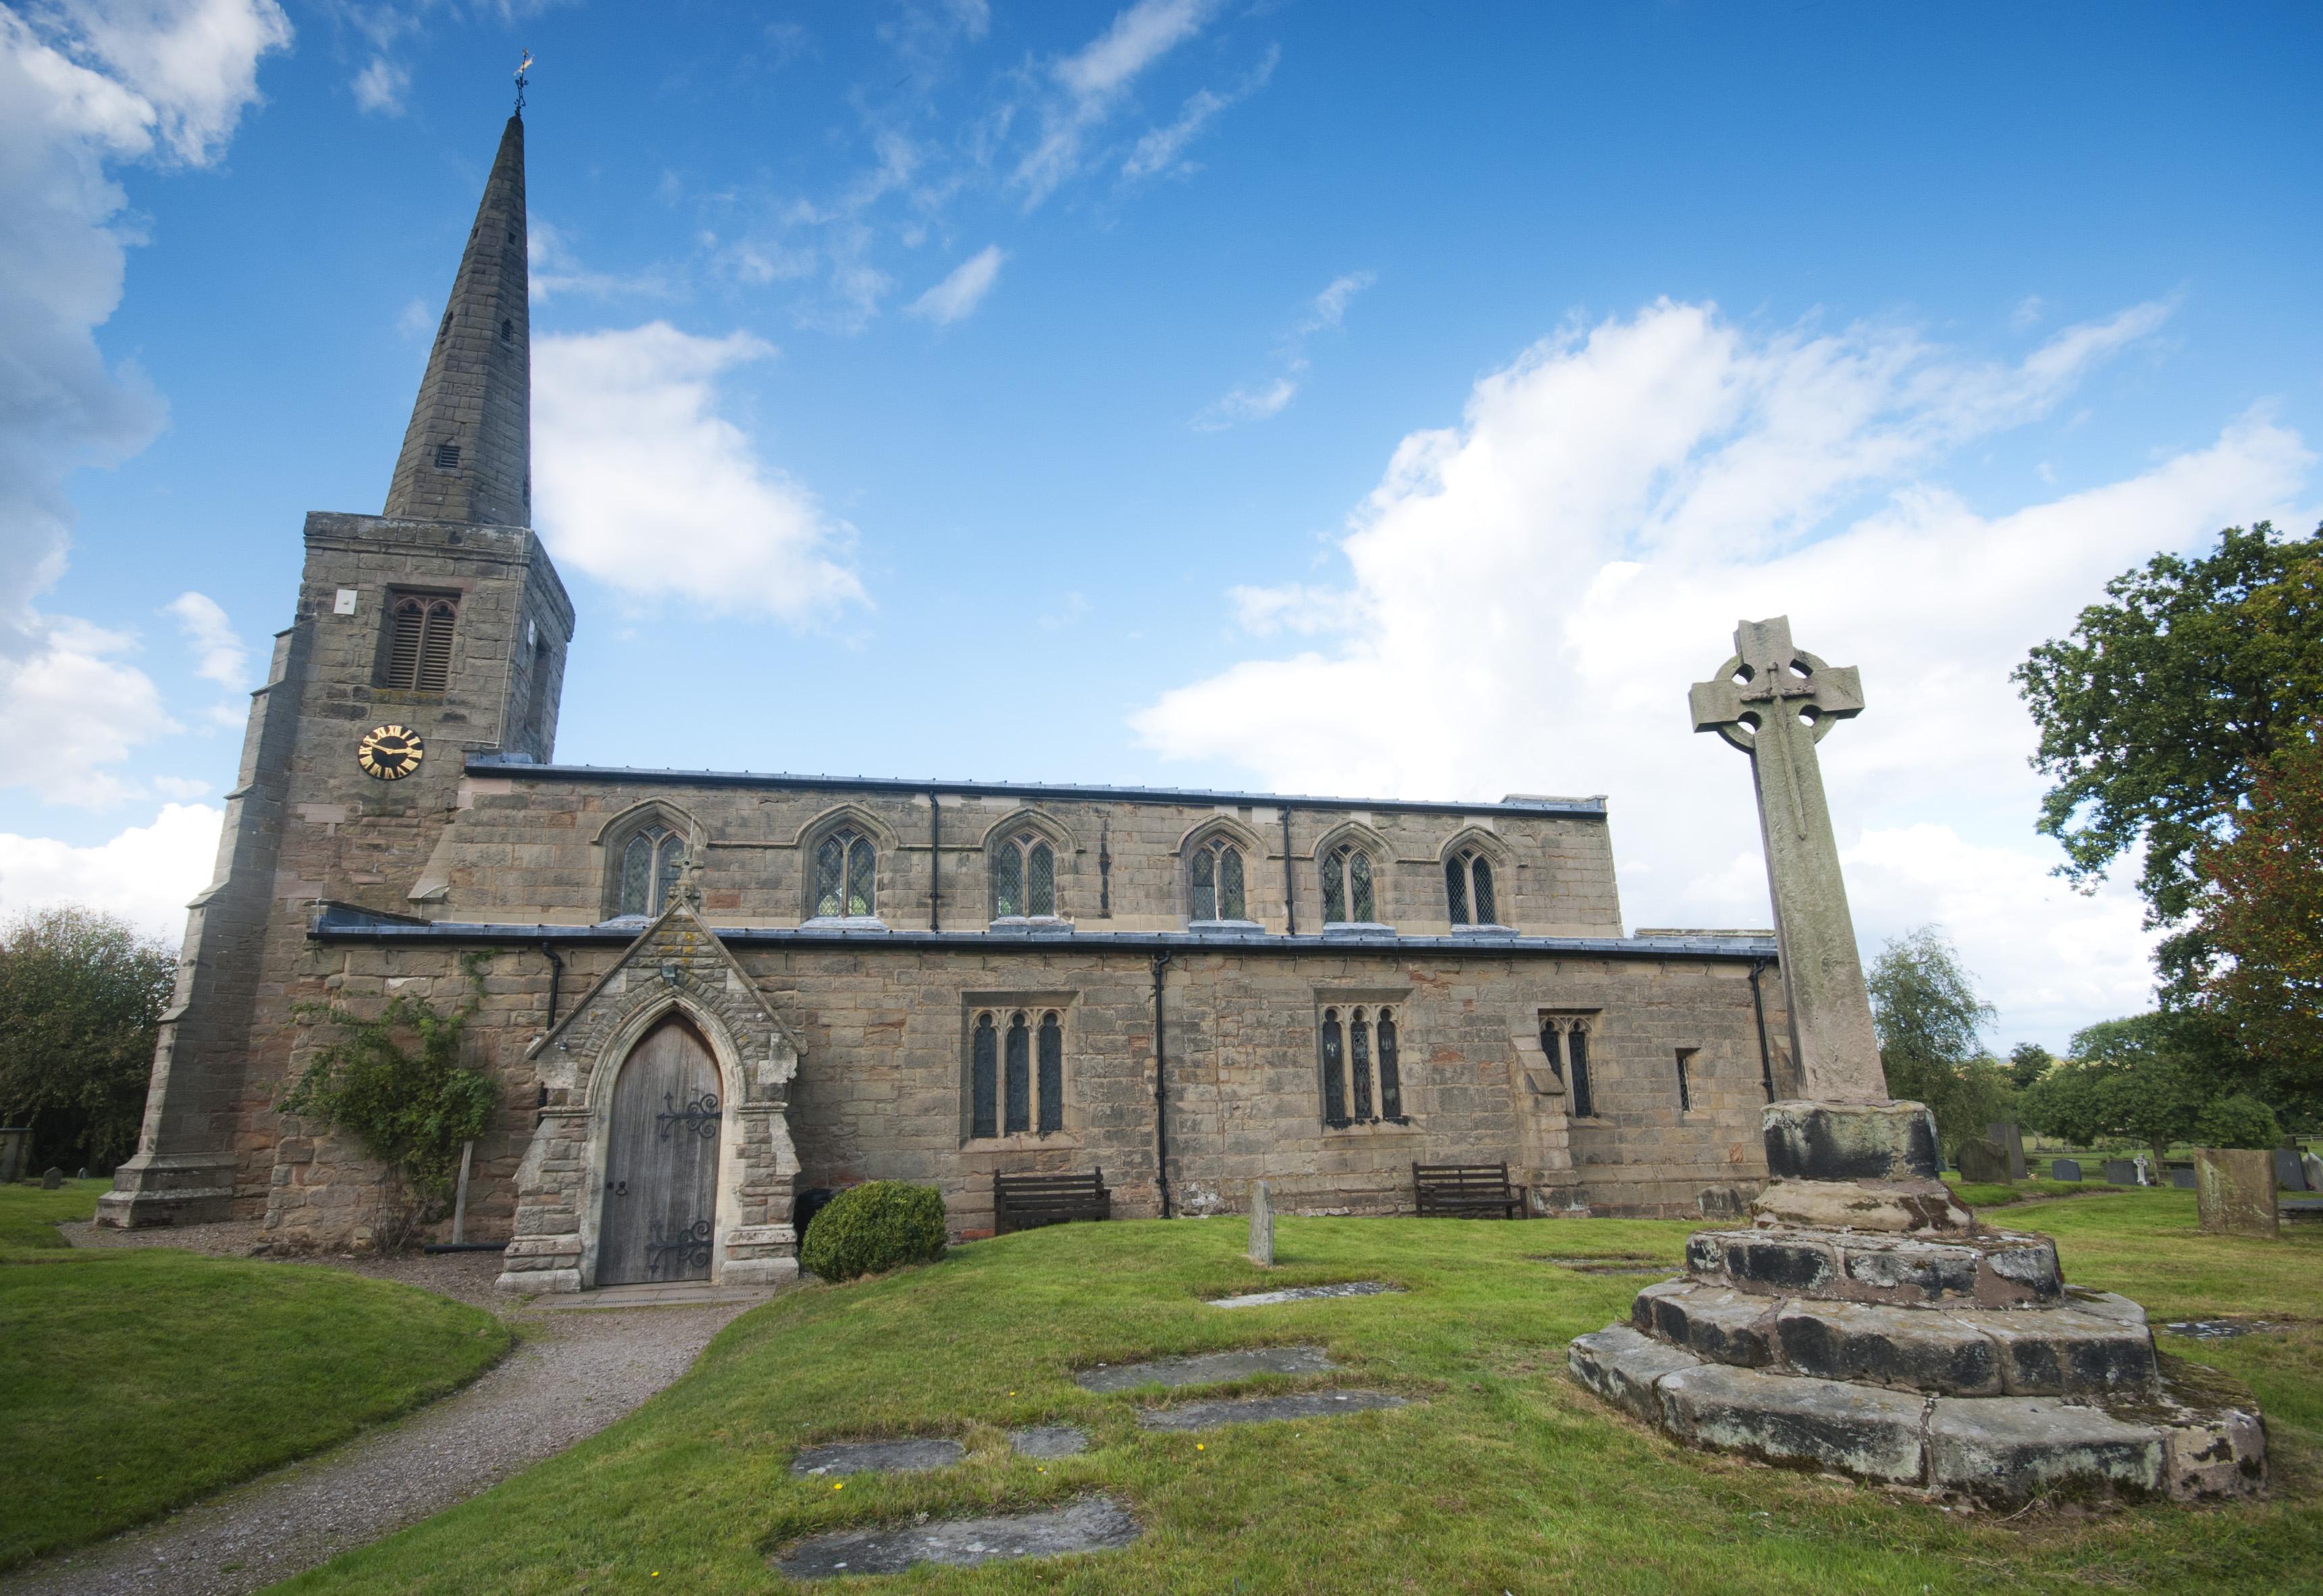 800px-St_Michael's_Church,_Hamstall_Ridware